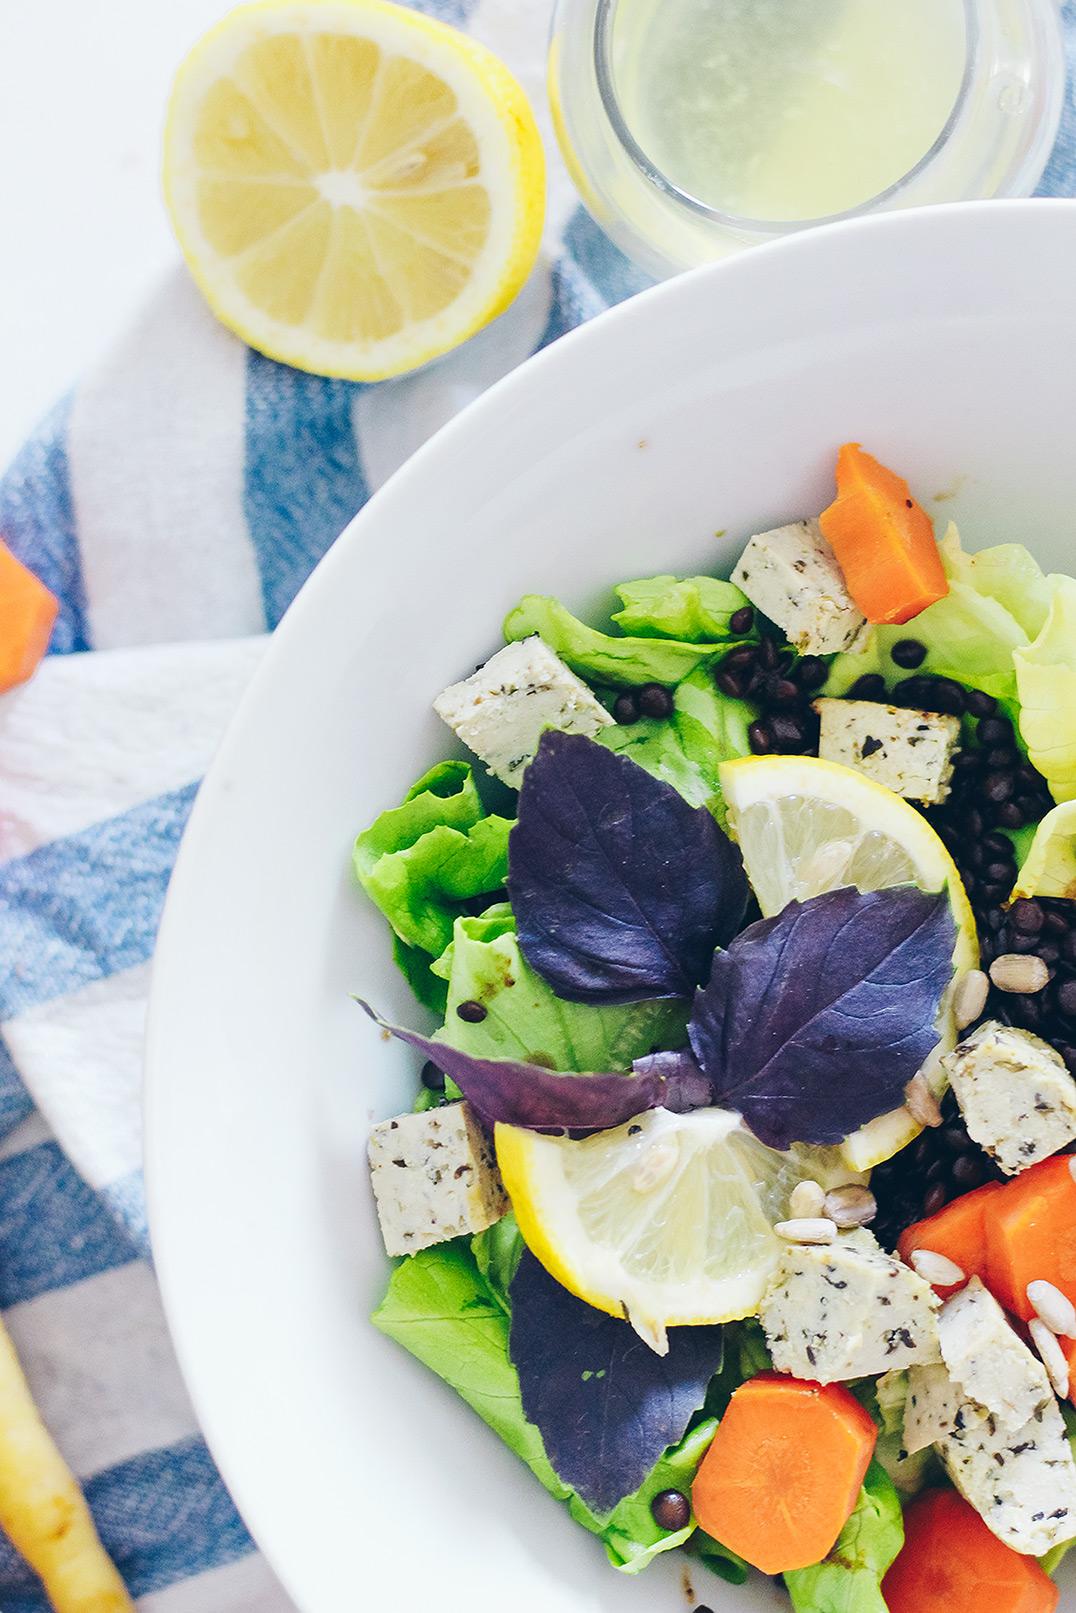 belugalinsen-salat-einfacher-linsen-salat